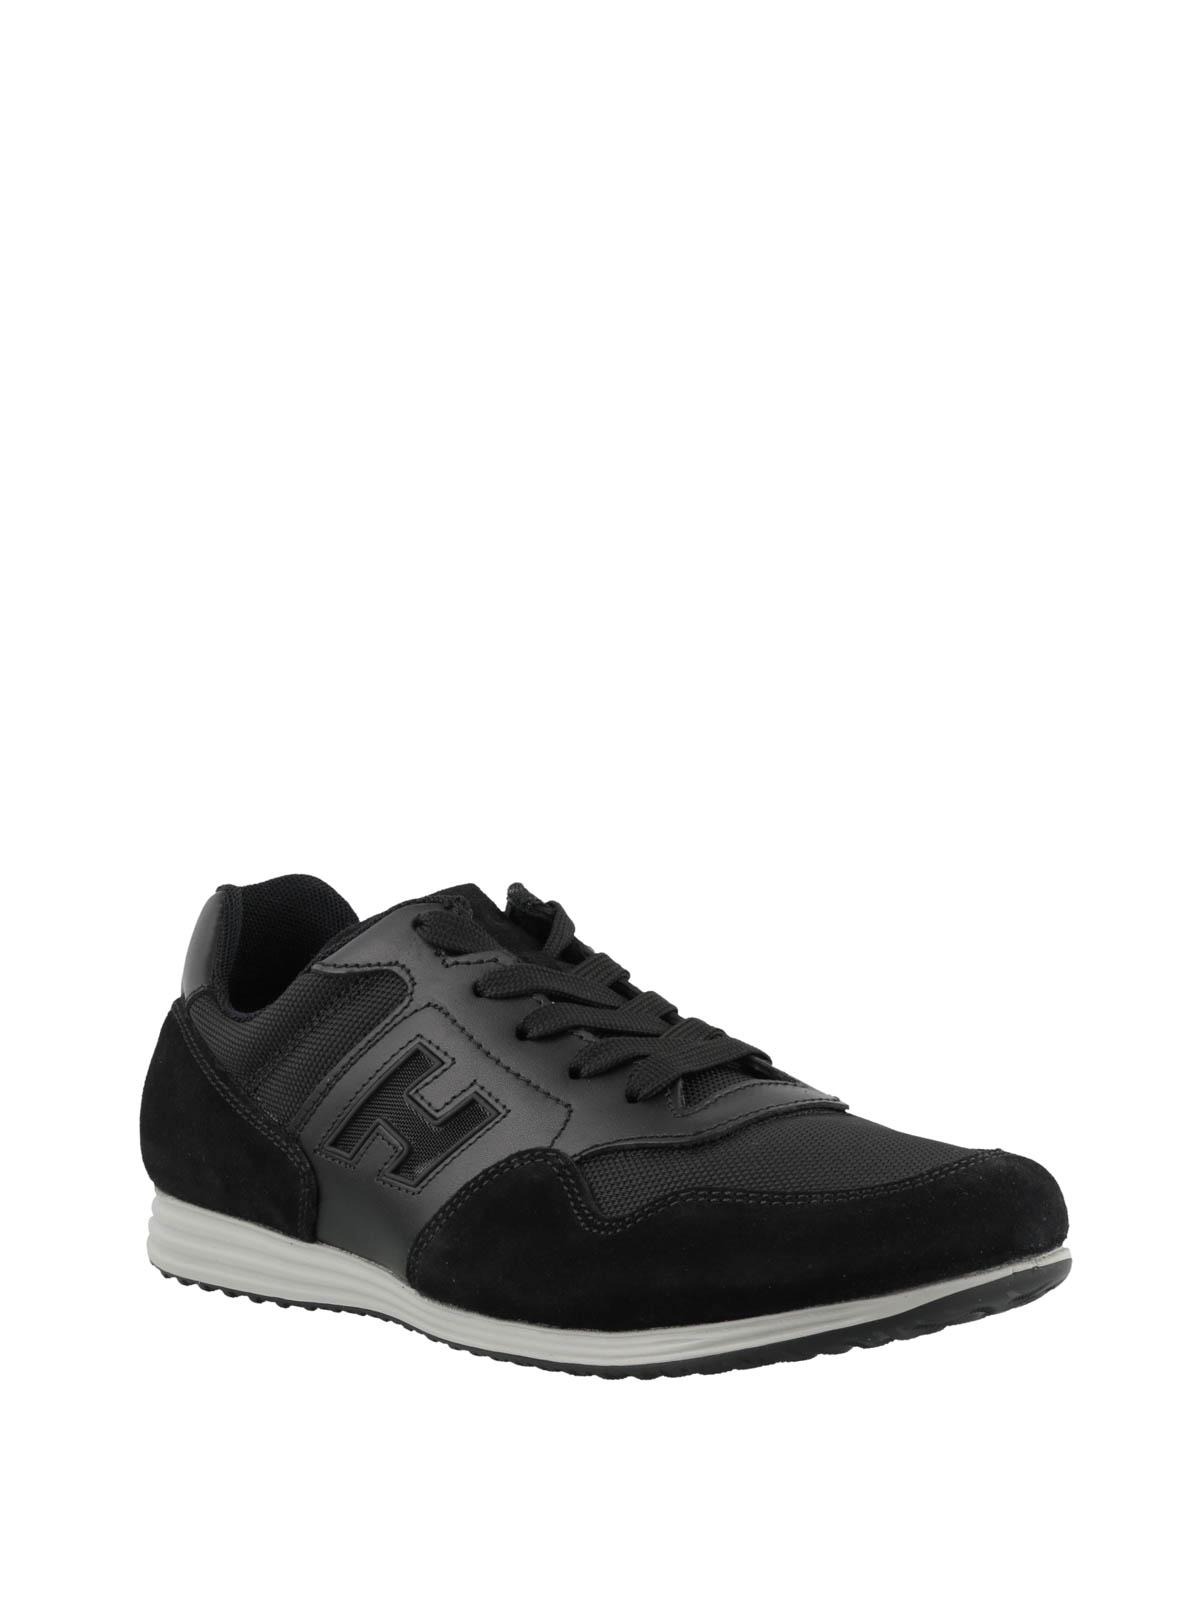 Sneakers Hogan - Sneaker Olympia X - H205 nere - HXM2050X602JMIB999